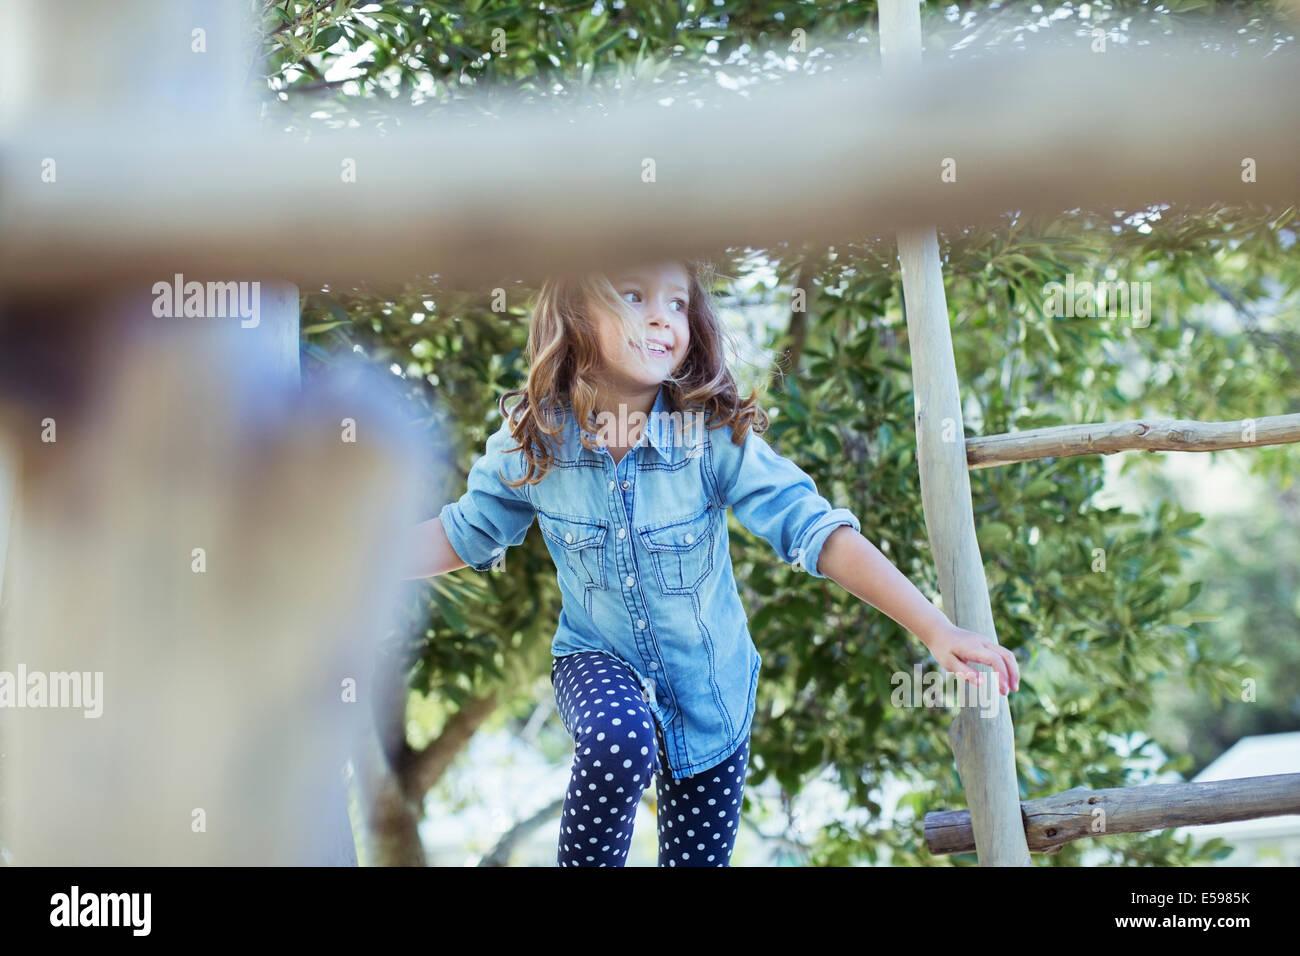 Klettern am Spielstruktur Mädchen Stockbild